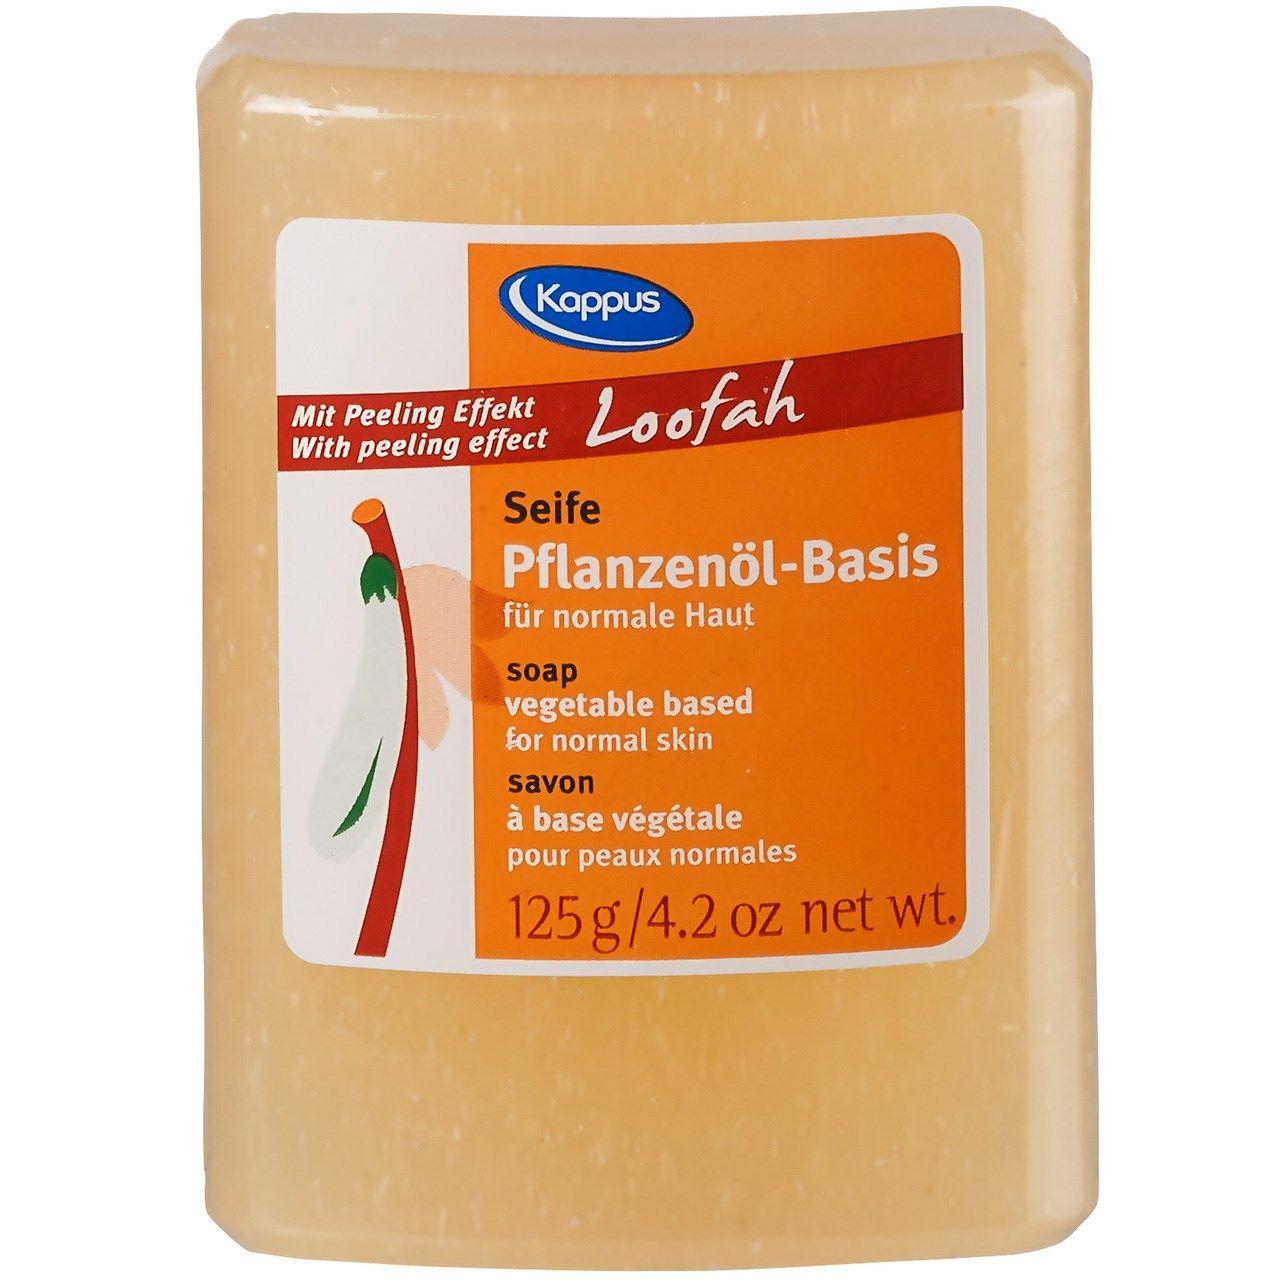 صابون لایه بردار کاپوس مدل Loofah مقدار 125 گرم -  - 1